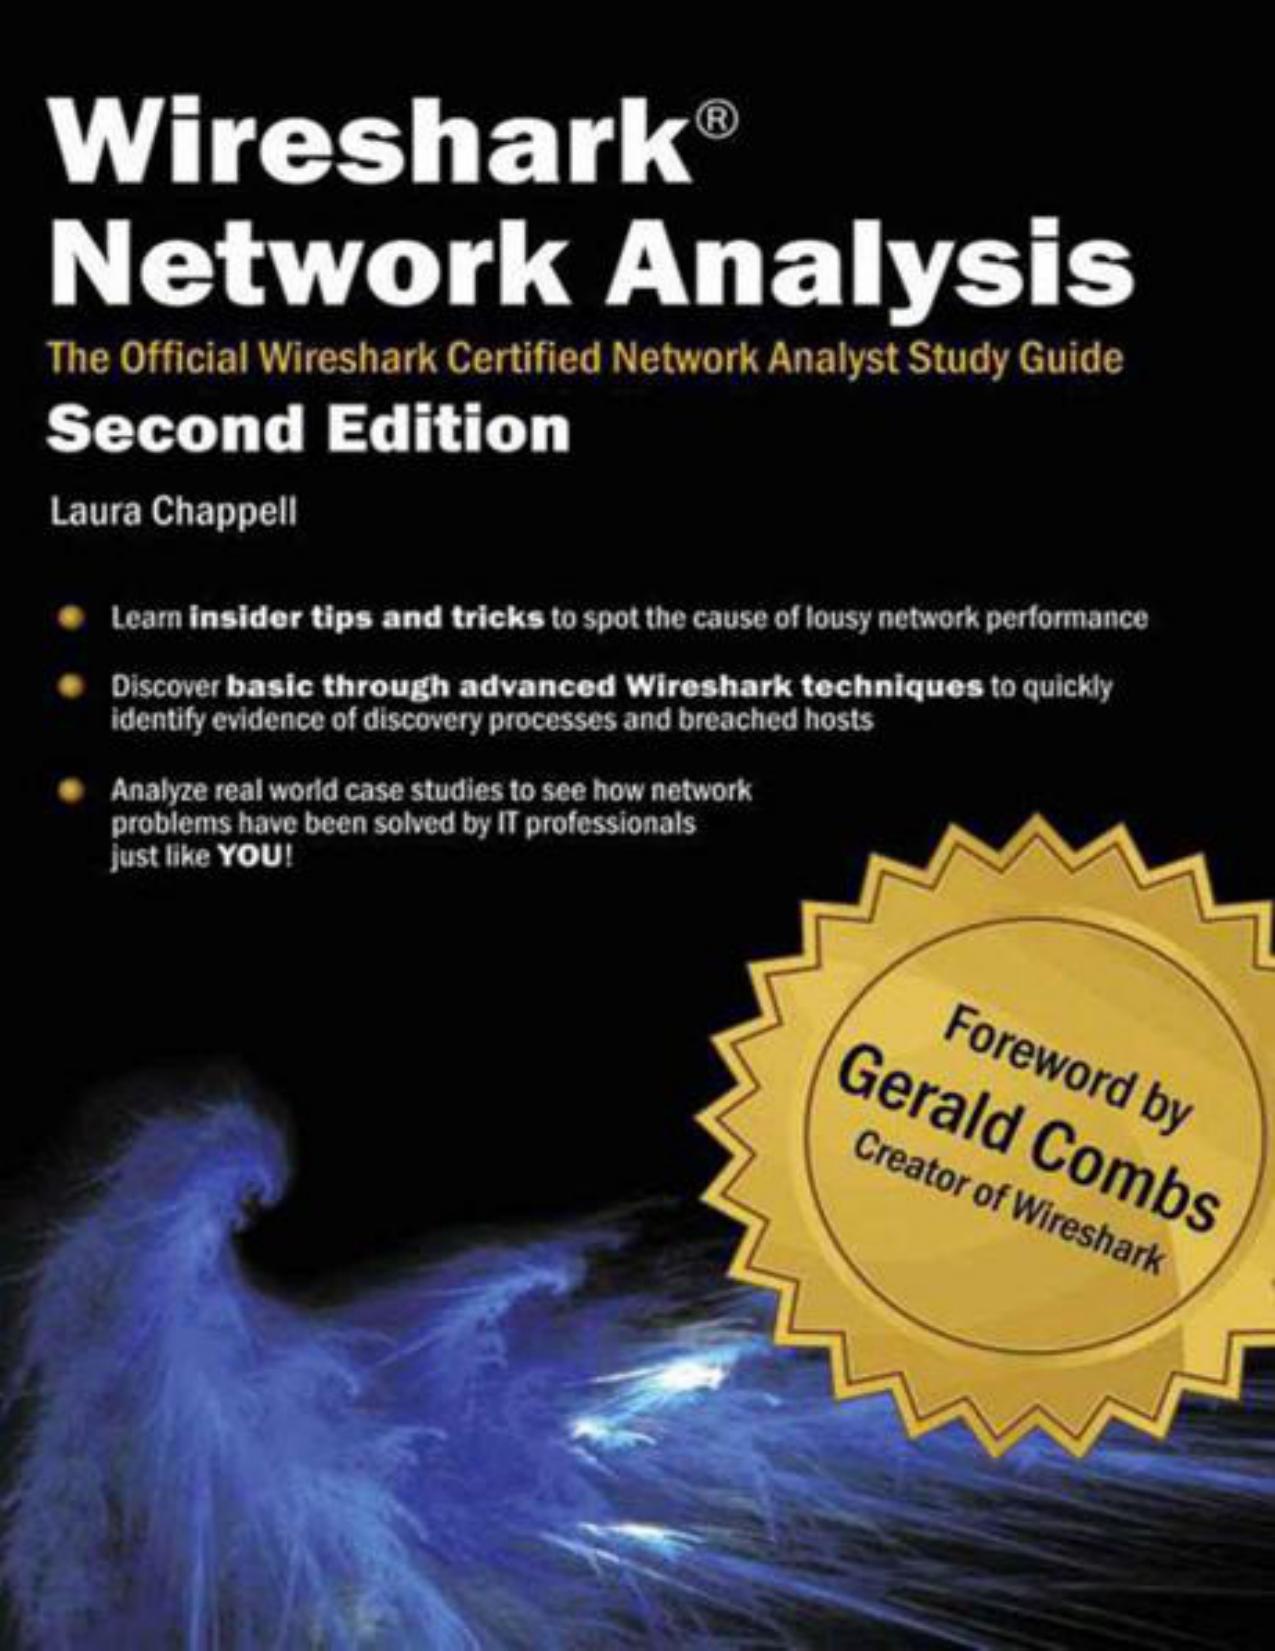 Wireshark Network Analysis The Official Wireshark Certified